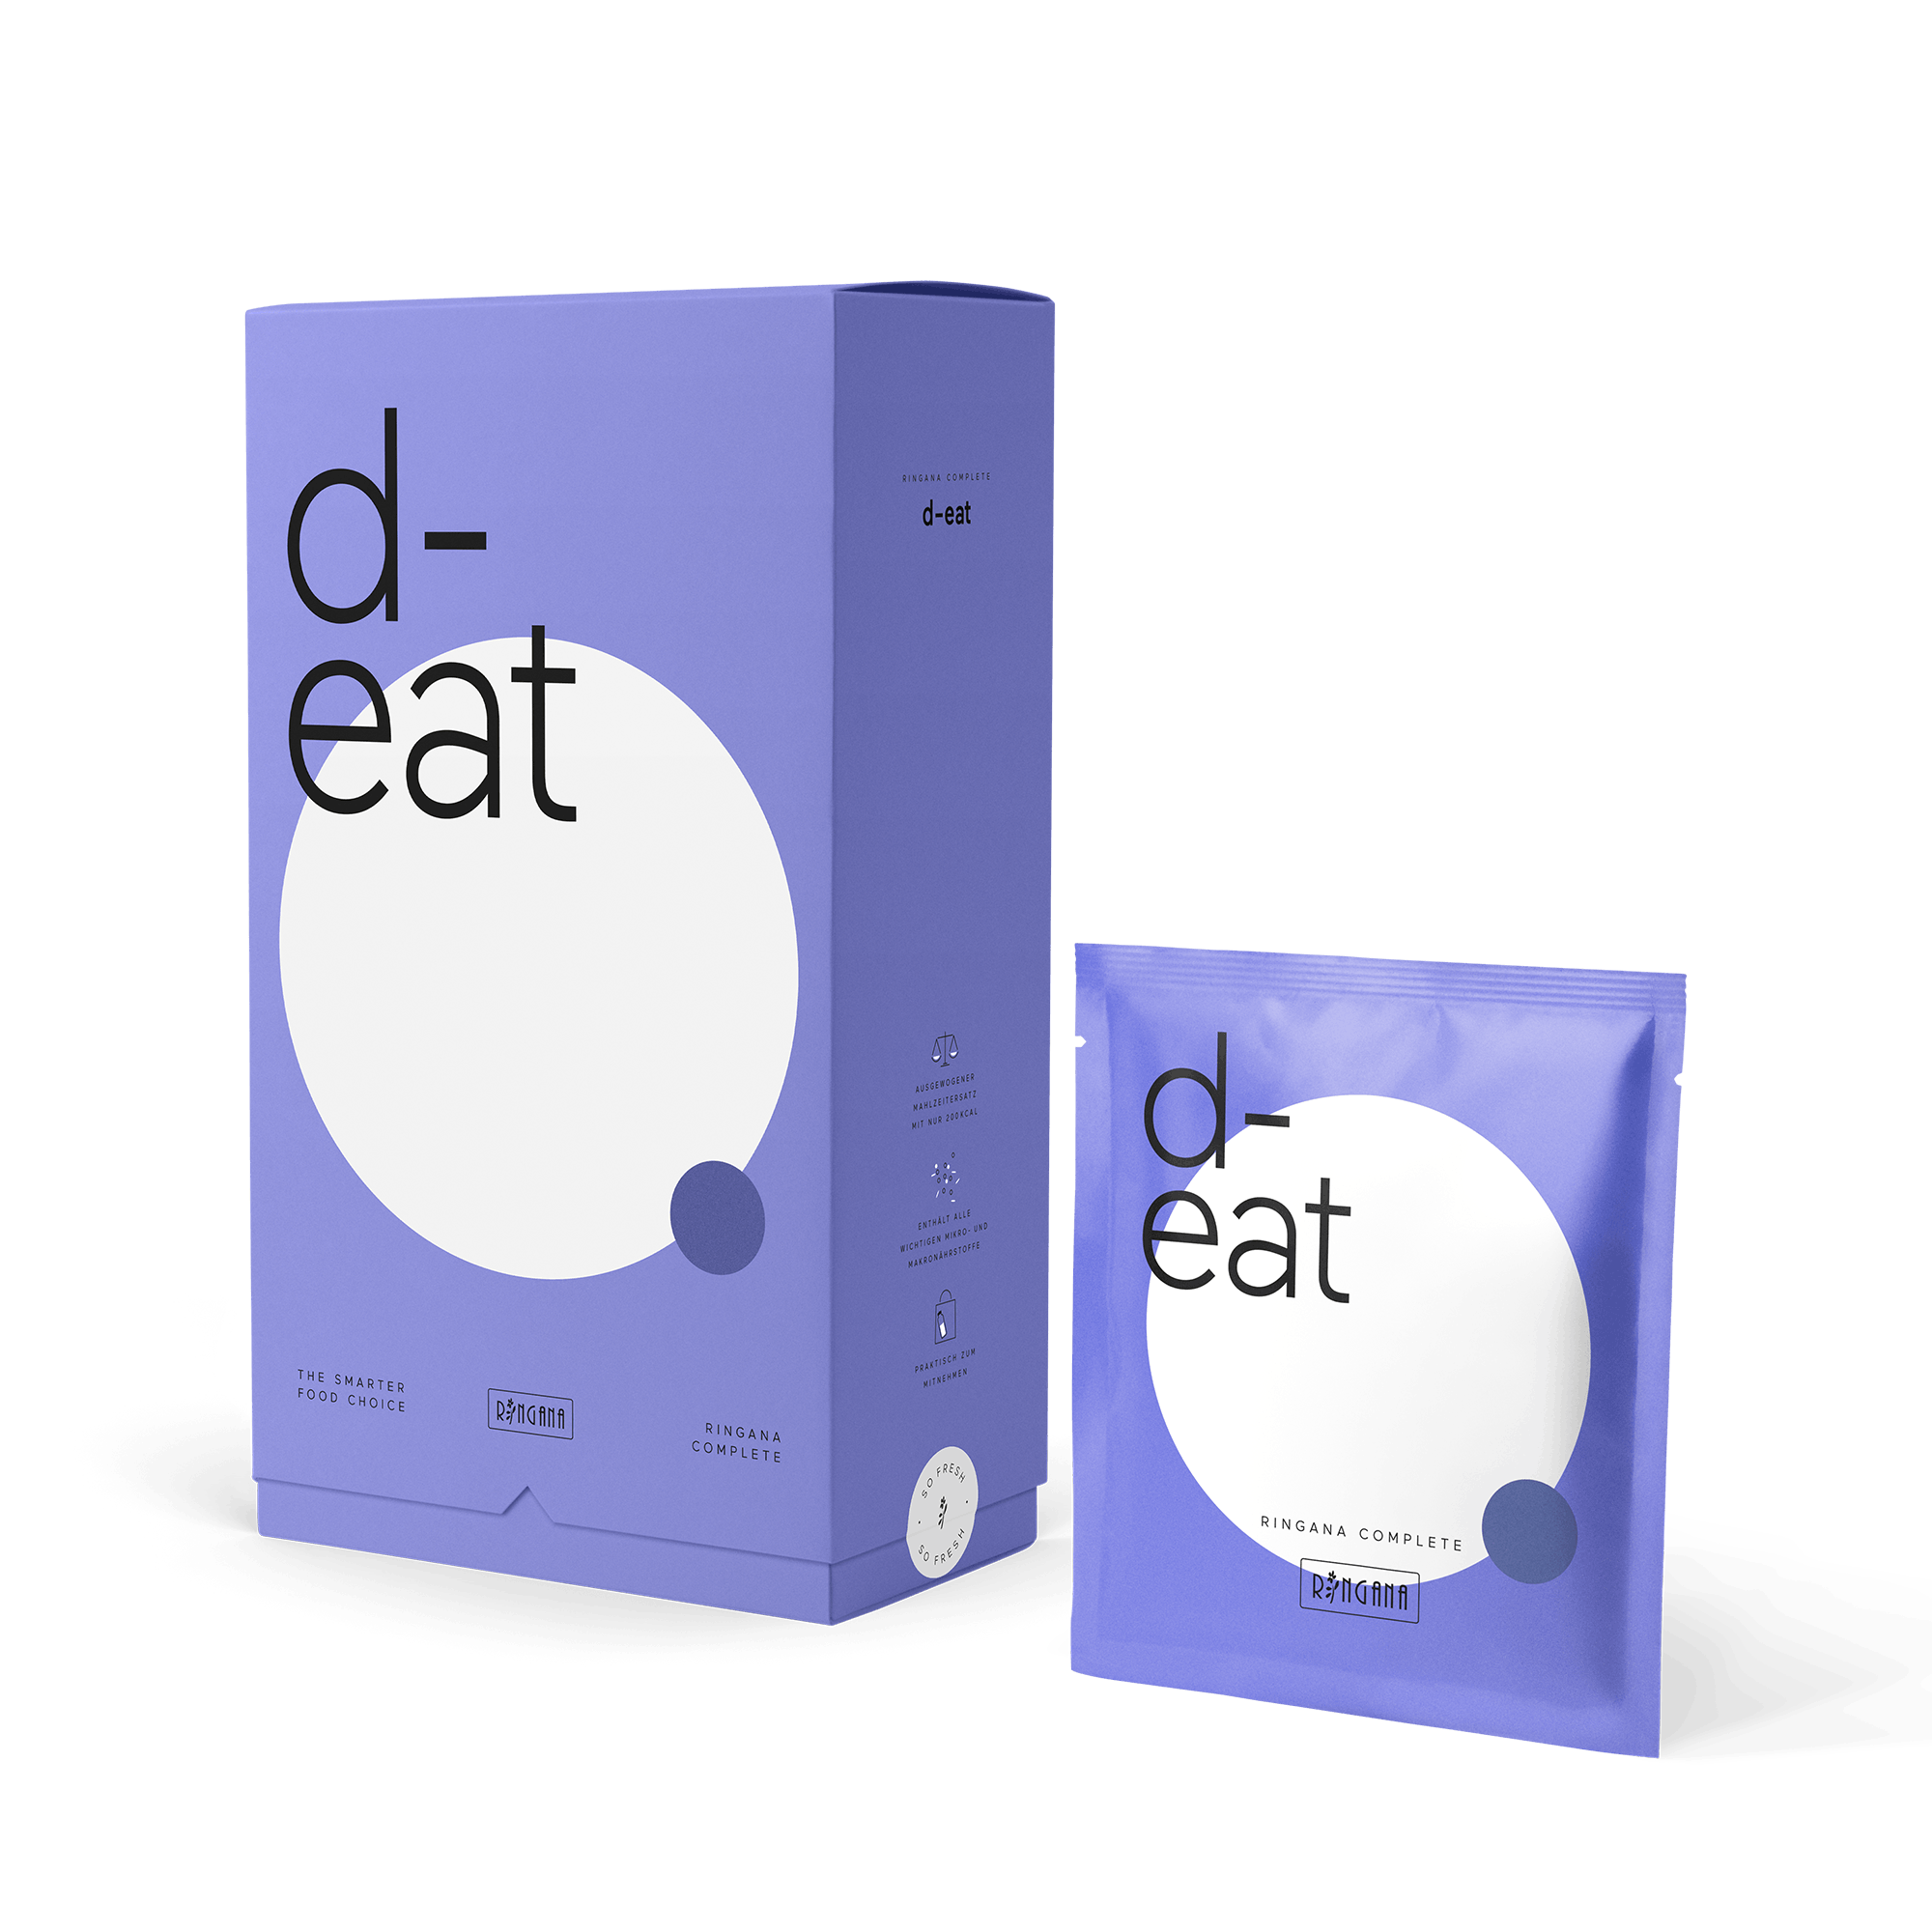 COMPLETE d-eat